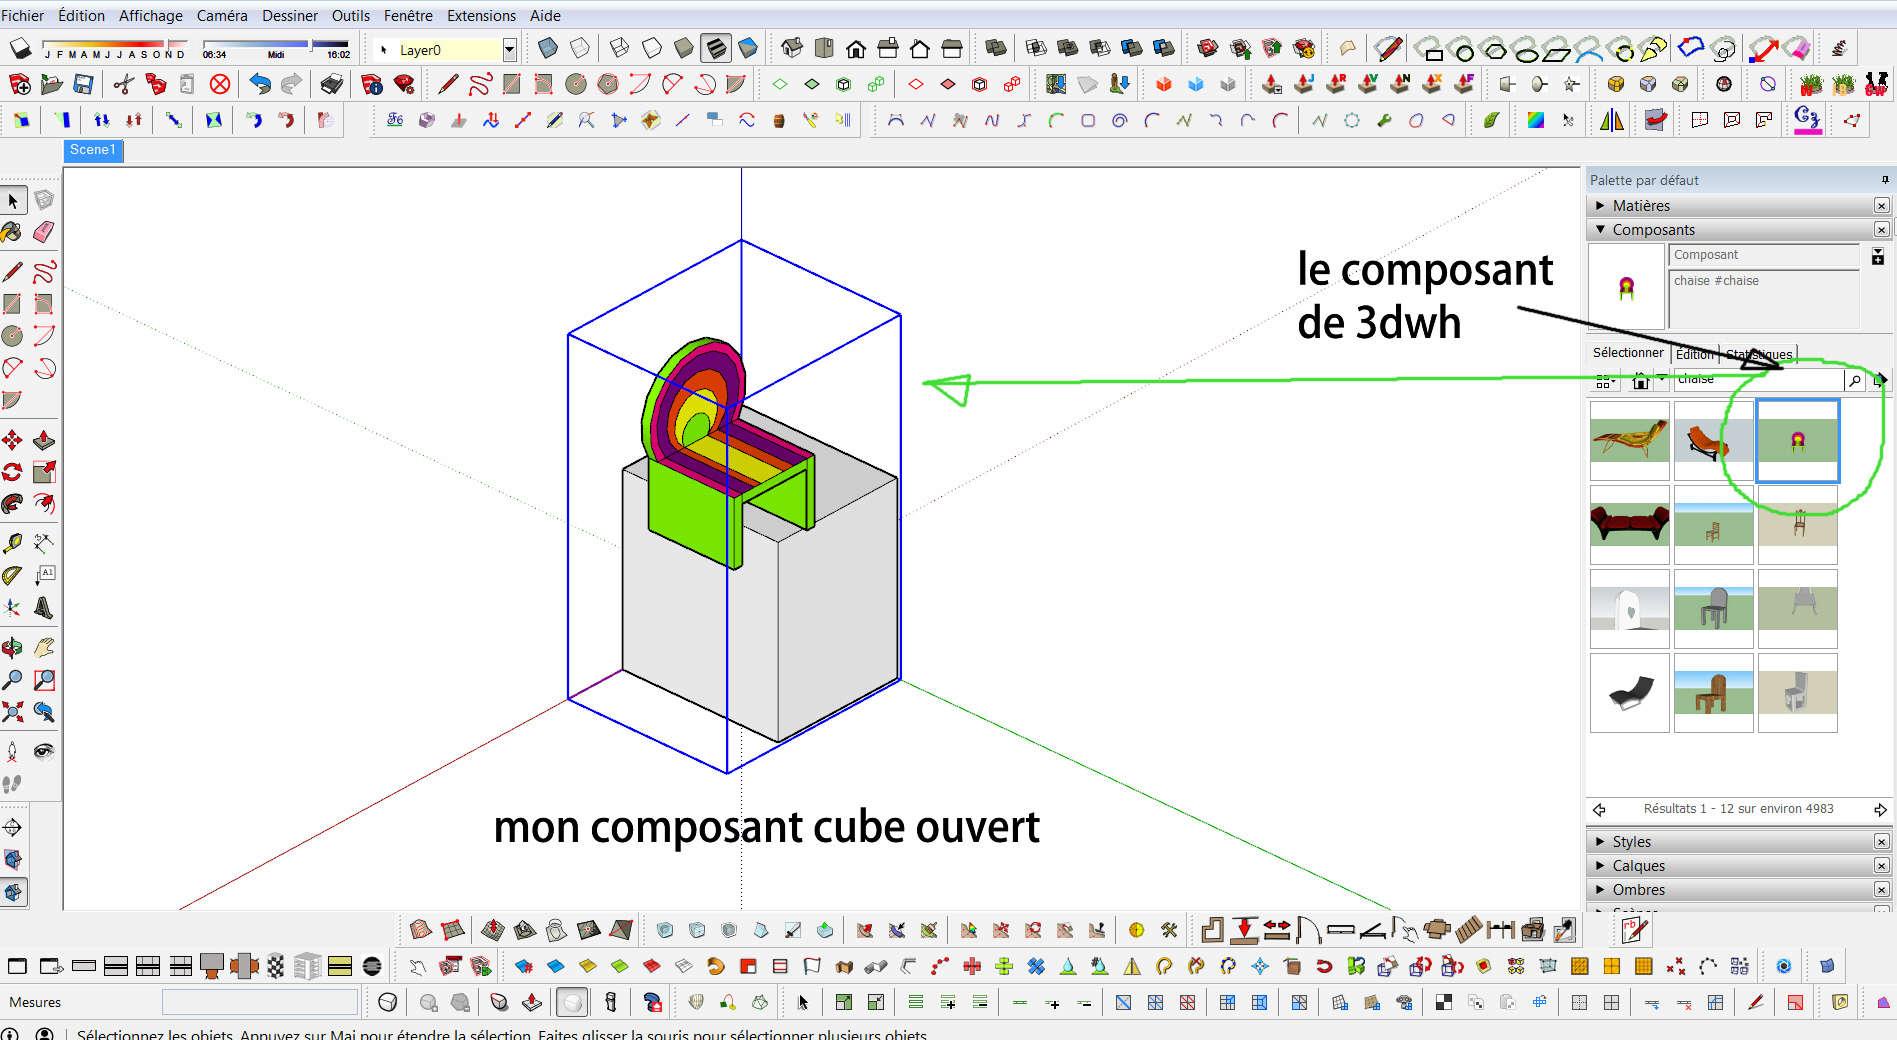 [SKETCHUP] Question concernant l'import de composants (résolu) 3dwh10